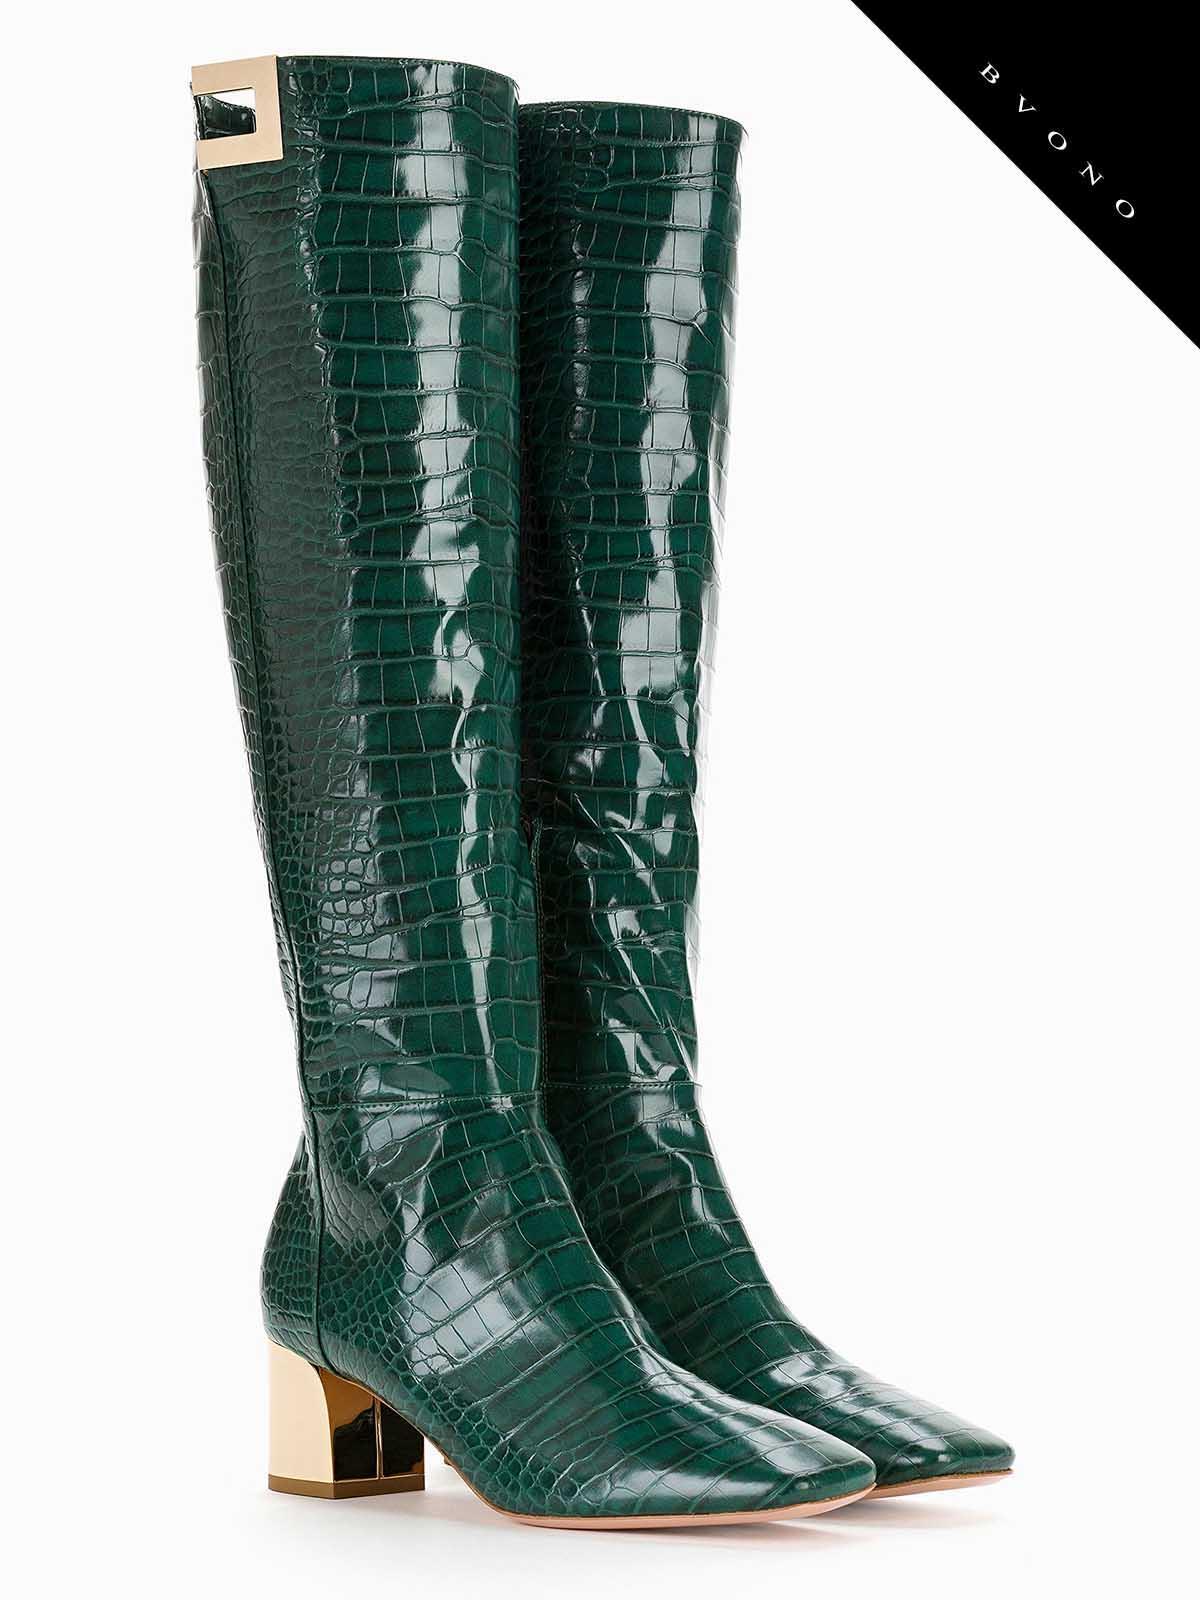 design senza tempo 238ca a14d1 stivali elisabetta franchi